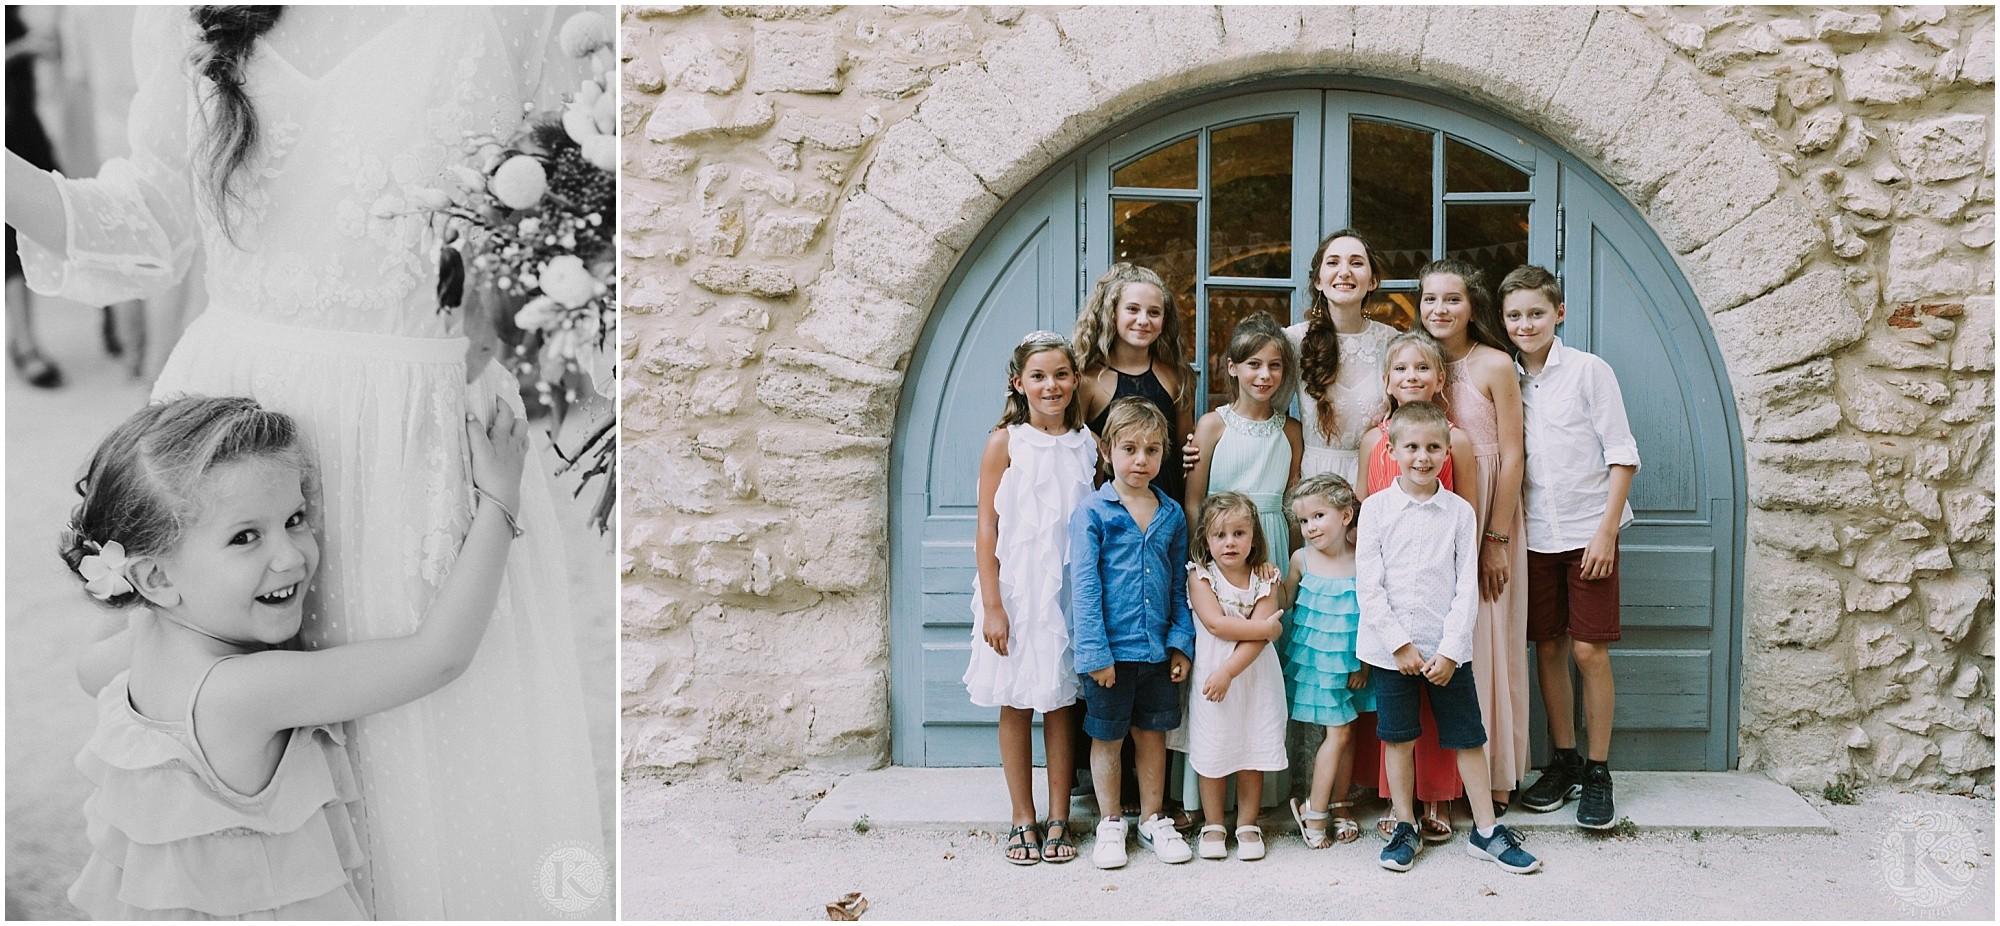 Kateryna-photos-photographe-mariage-vaucluse-provence-avignon-ferme-st-hugues_0071.jpg